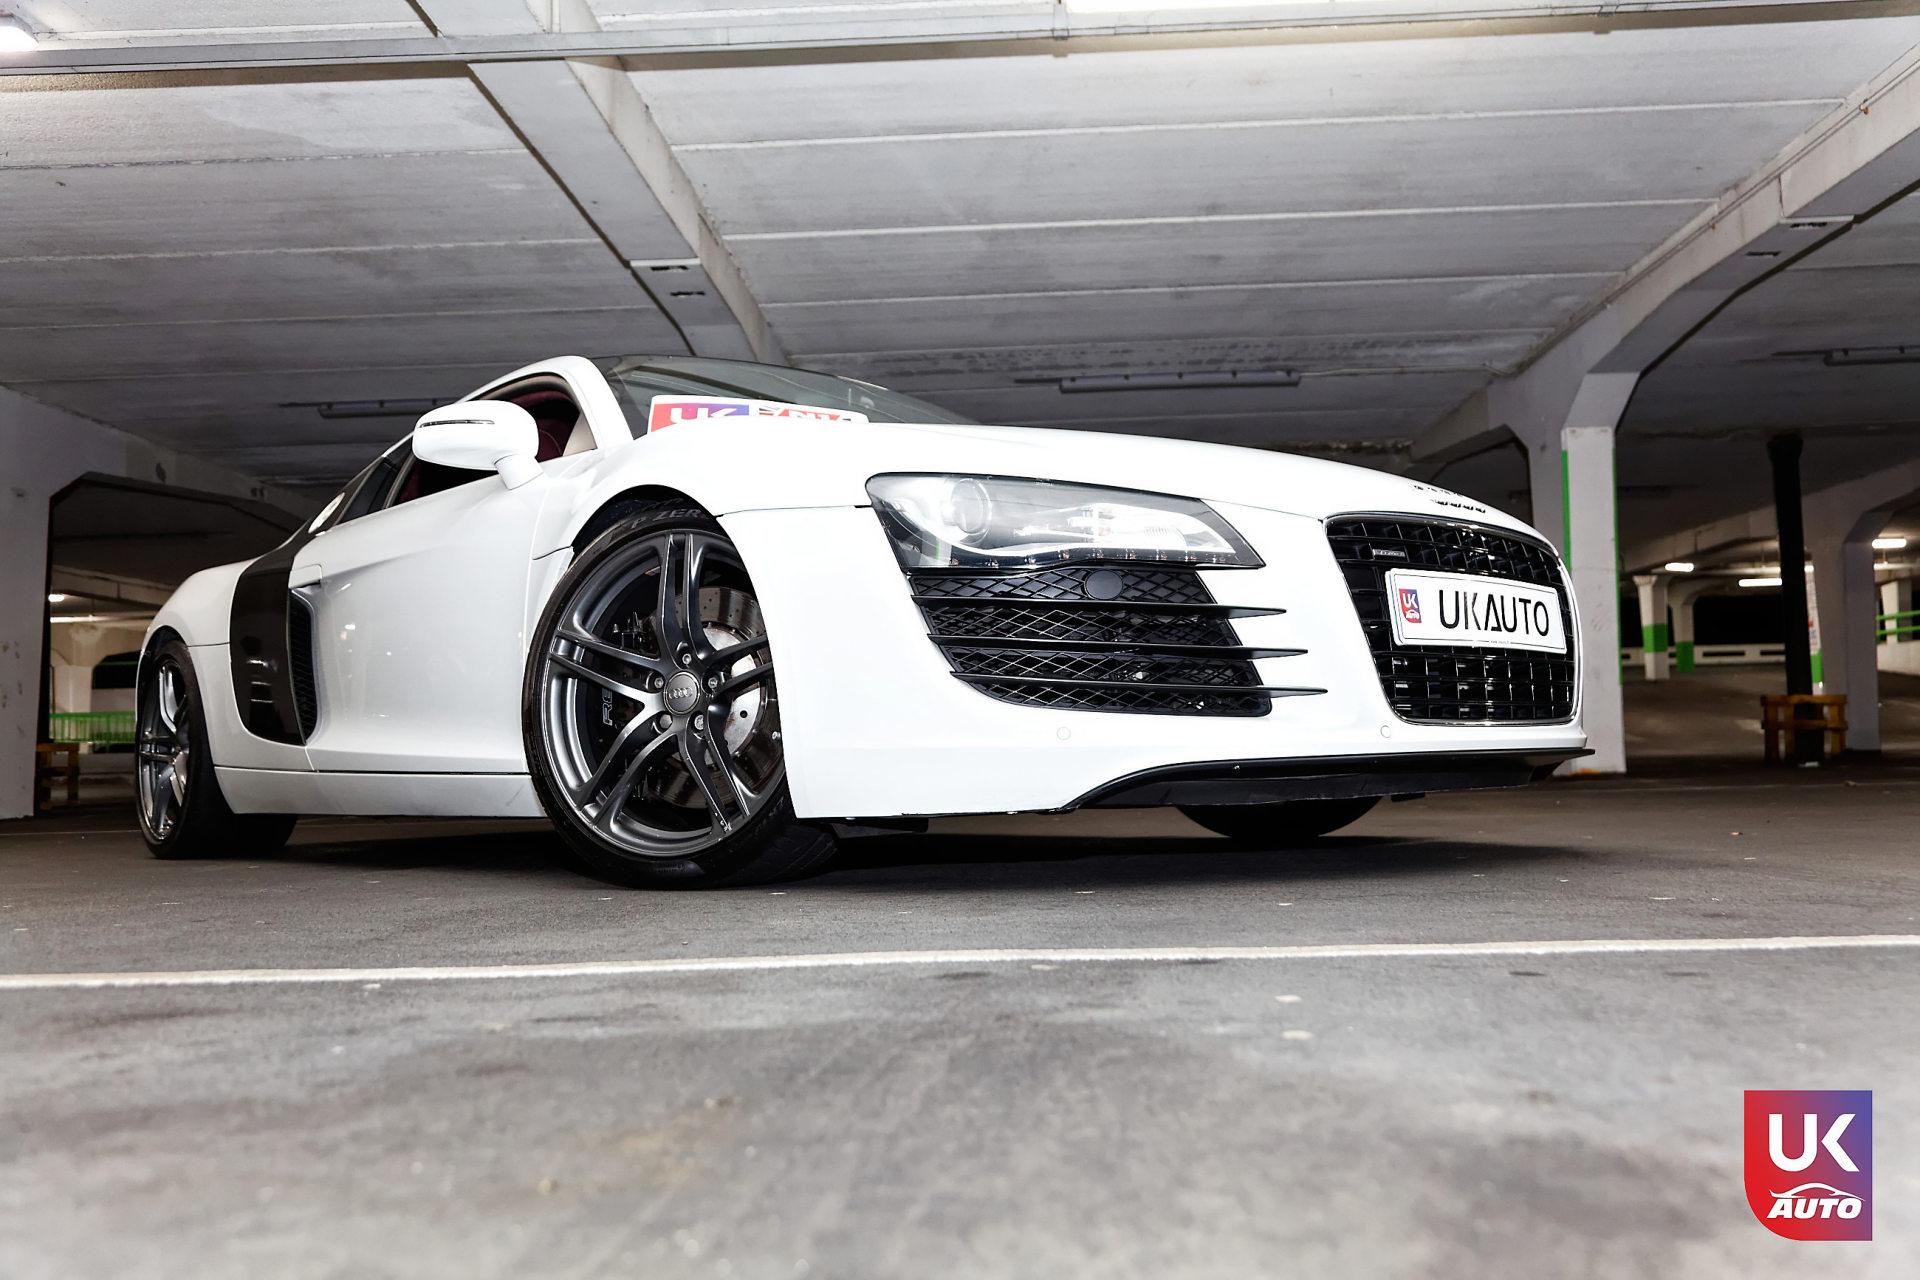 Audi R8 Import audi r8 lhd angleterre audi R8 V8 TFSI AUDI uk importation audi LHD volant a gauche10 DxO - AUDI R8 ANGLETERRE IMPORTATION AUDI R8 UK IMPORT SUPERCAR FELICITATION A CHARLES POUR CET IMPORT